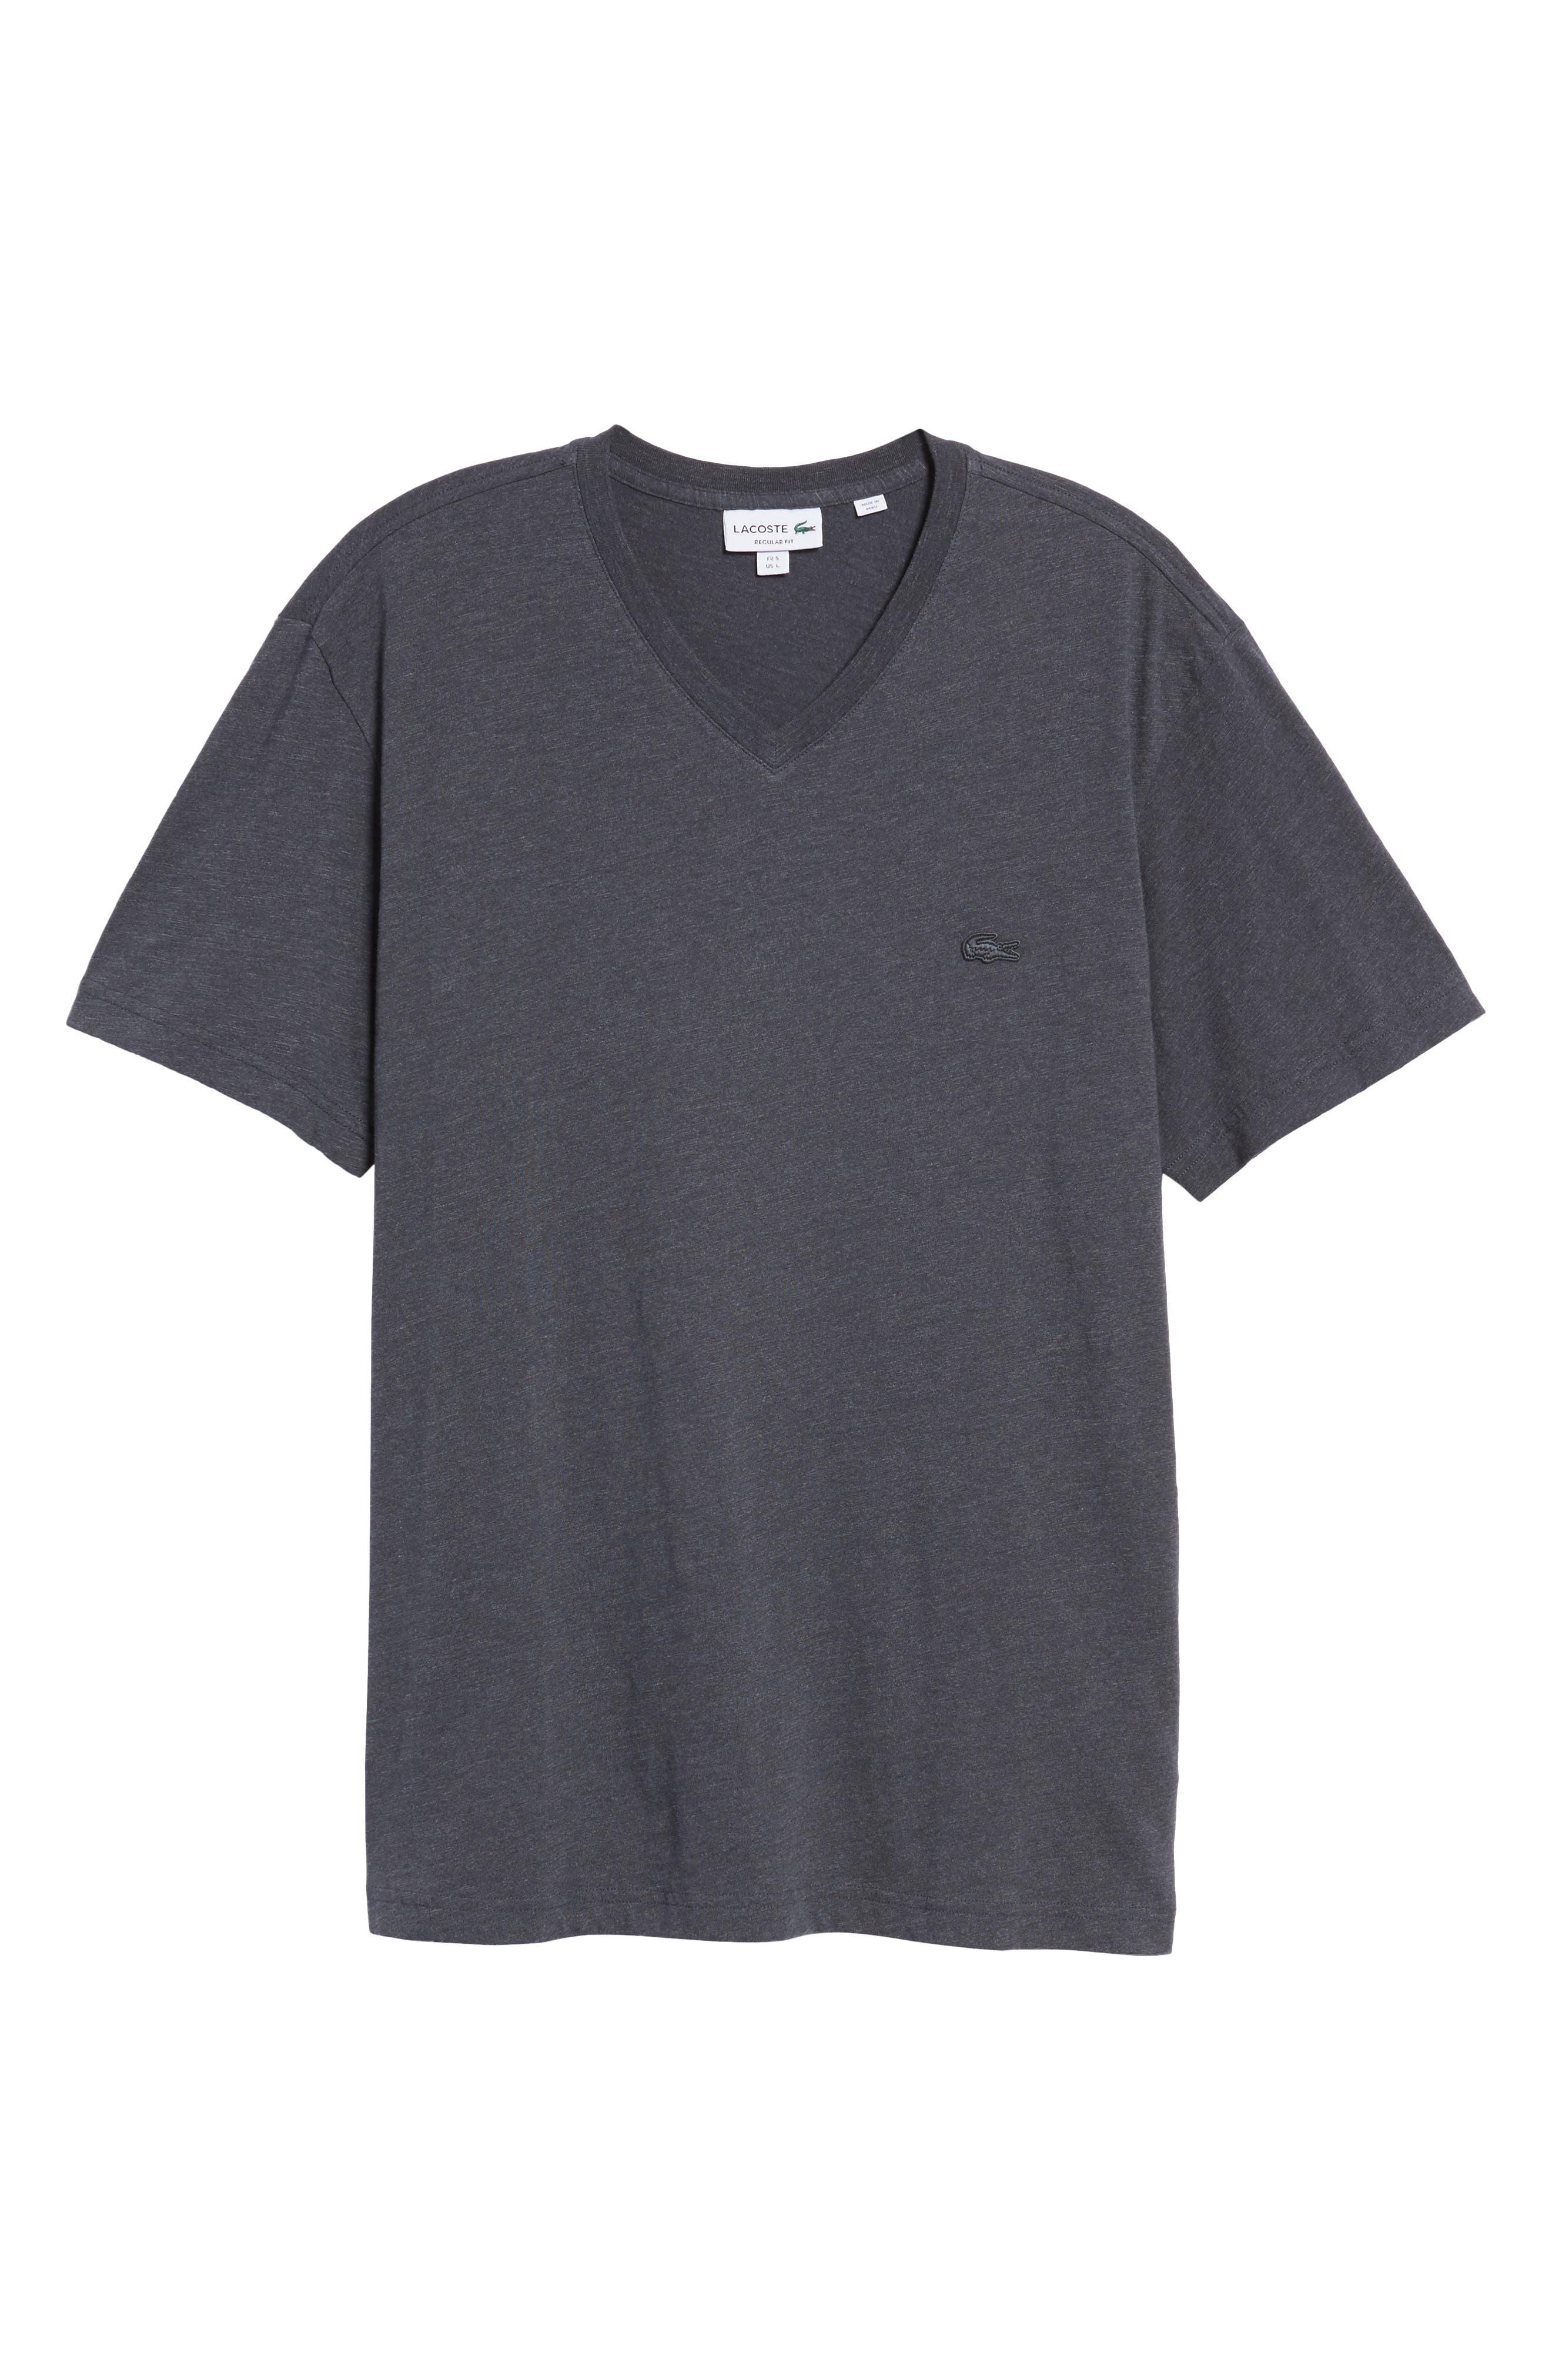 Lacoste V-Neck T-Shirt